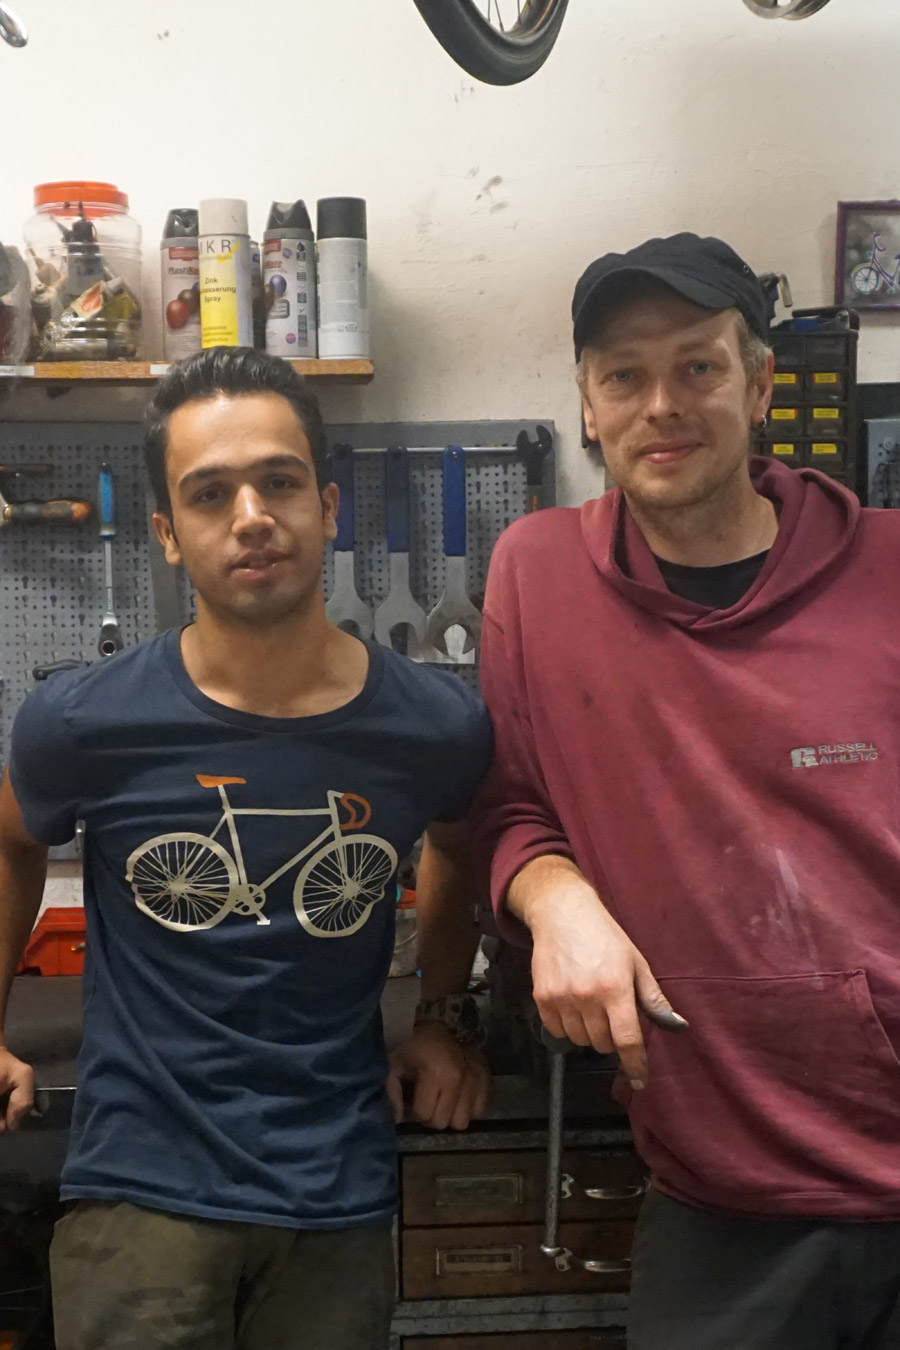 Mohammed und sein Kollege Sebastian in der Lila-Leeze-Werkstatt